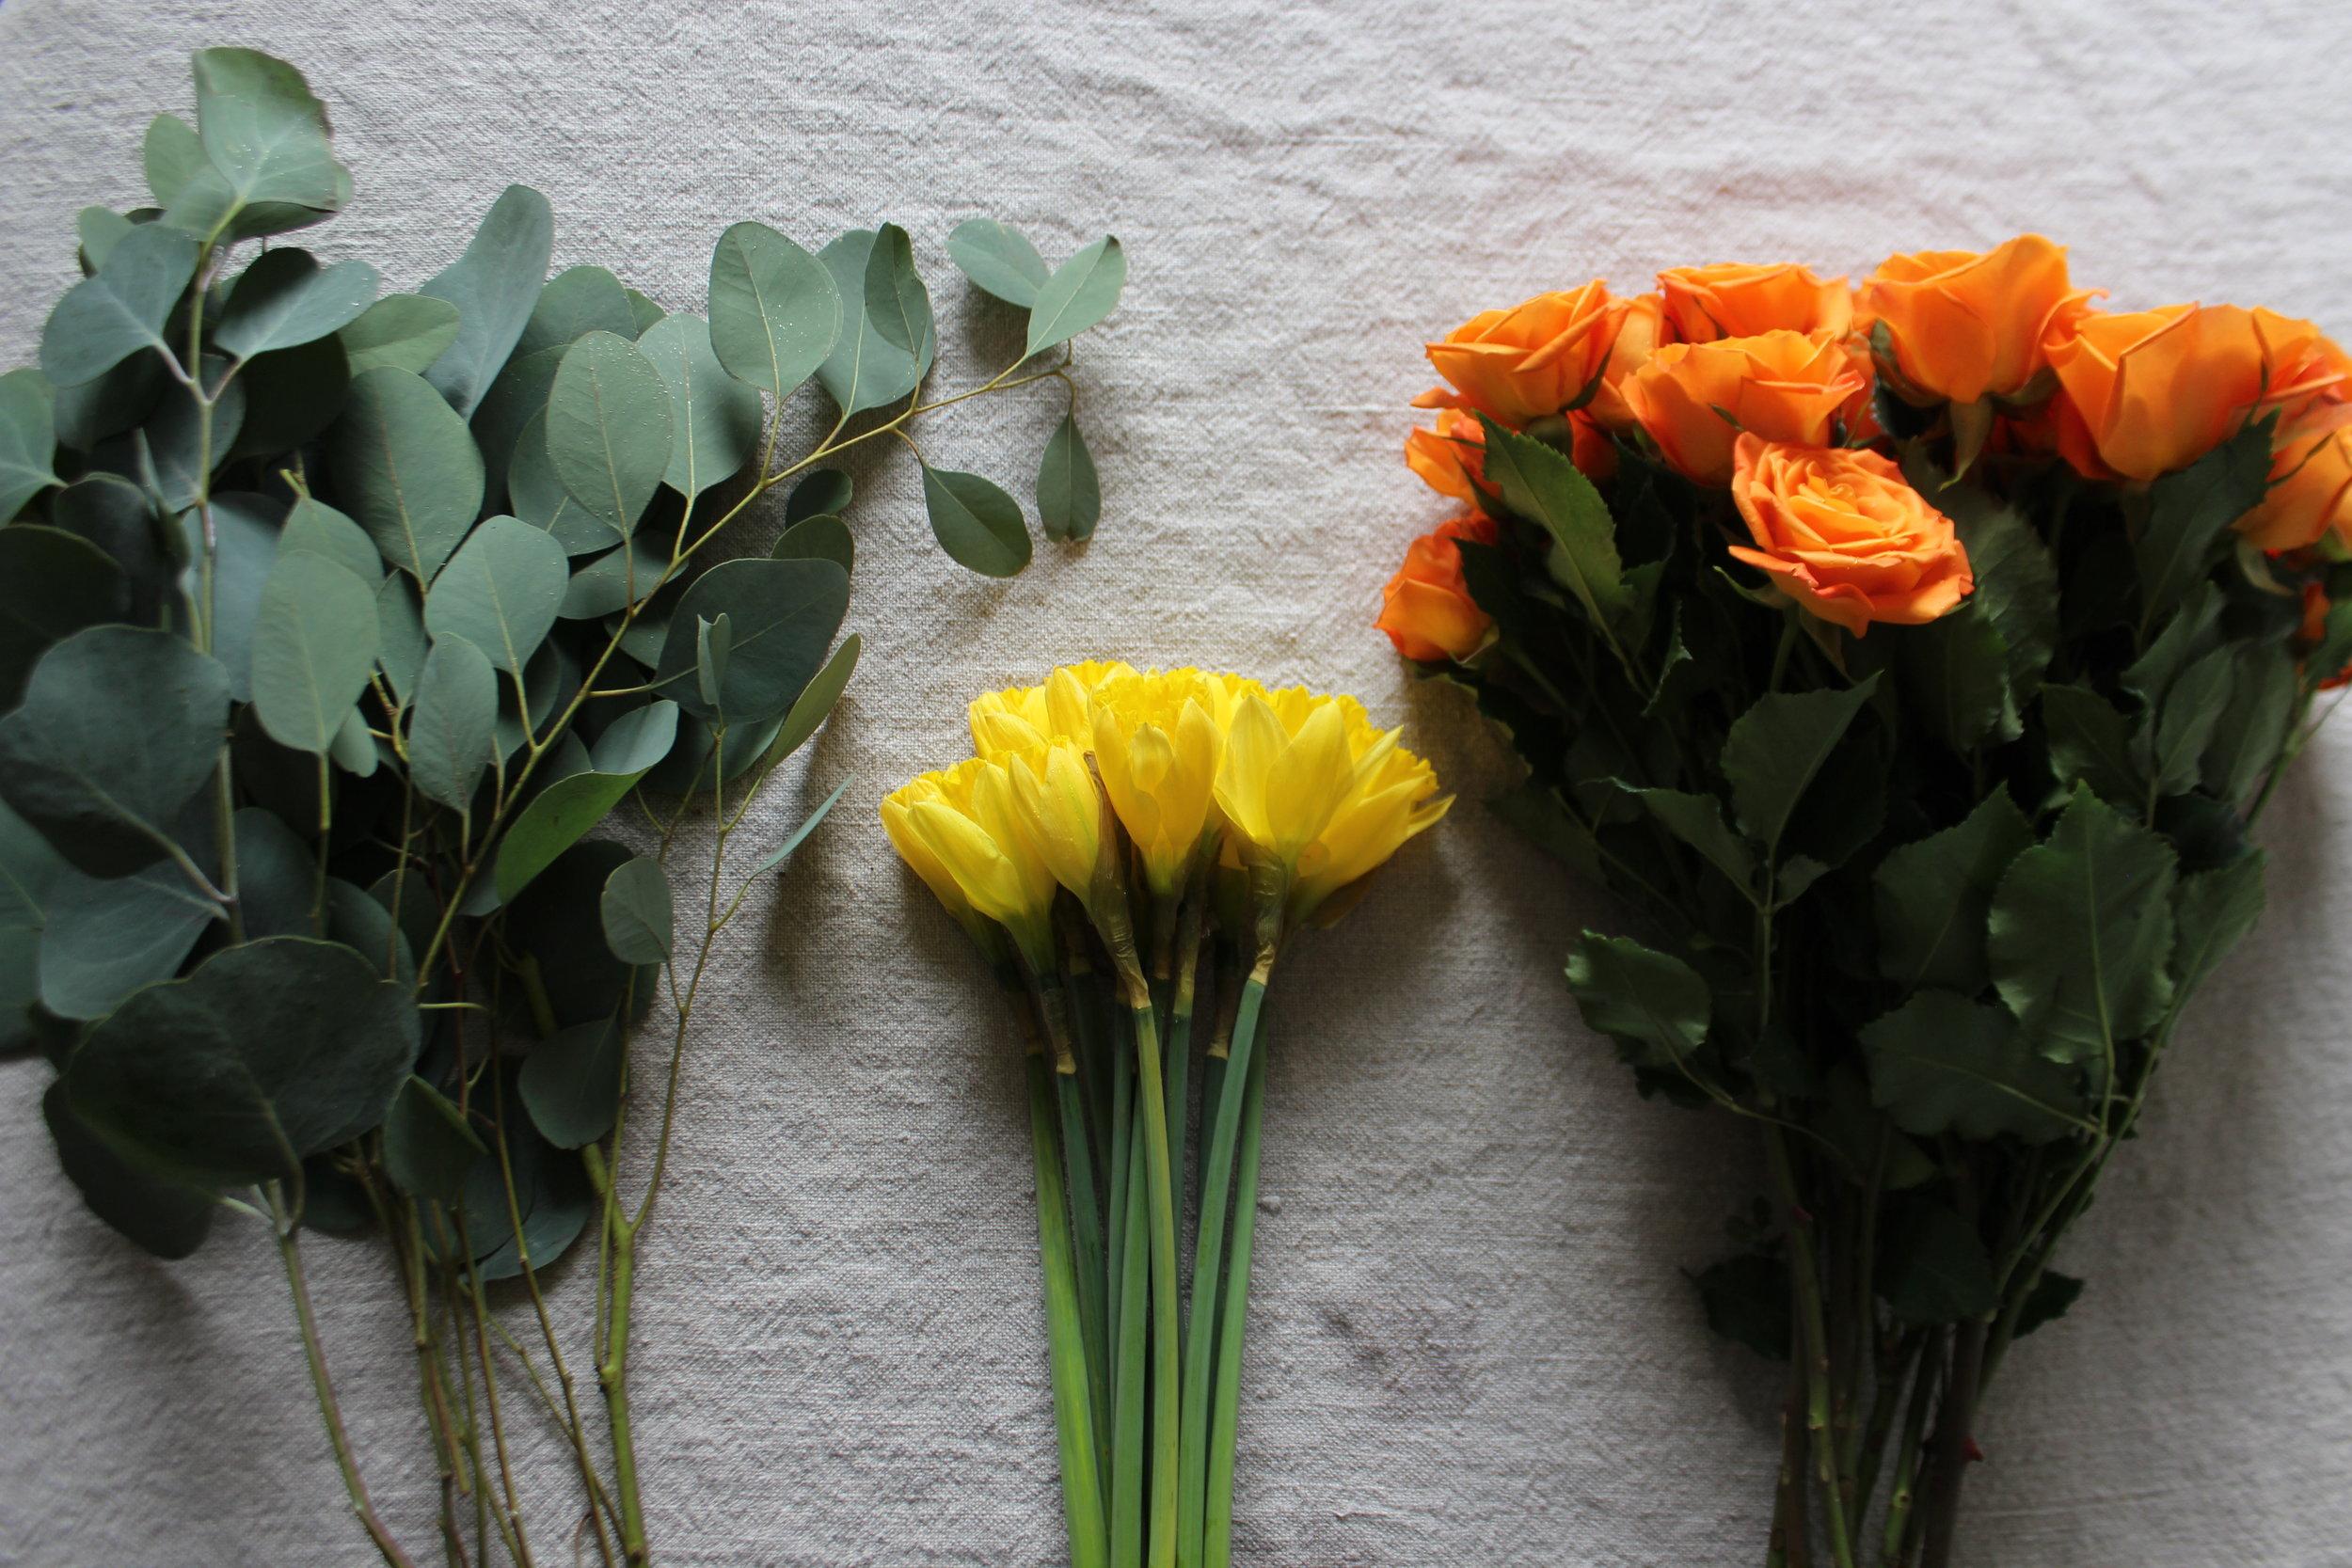 Silver Dollar Eucalyptus: $2.99 a bunch, Daffodils: $1.49 a bunch, Spray Roses: $4.99 a bunch = $9.47 total!